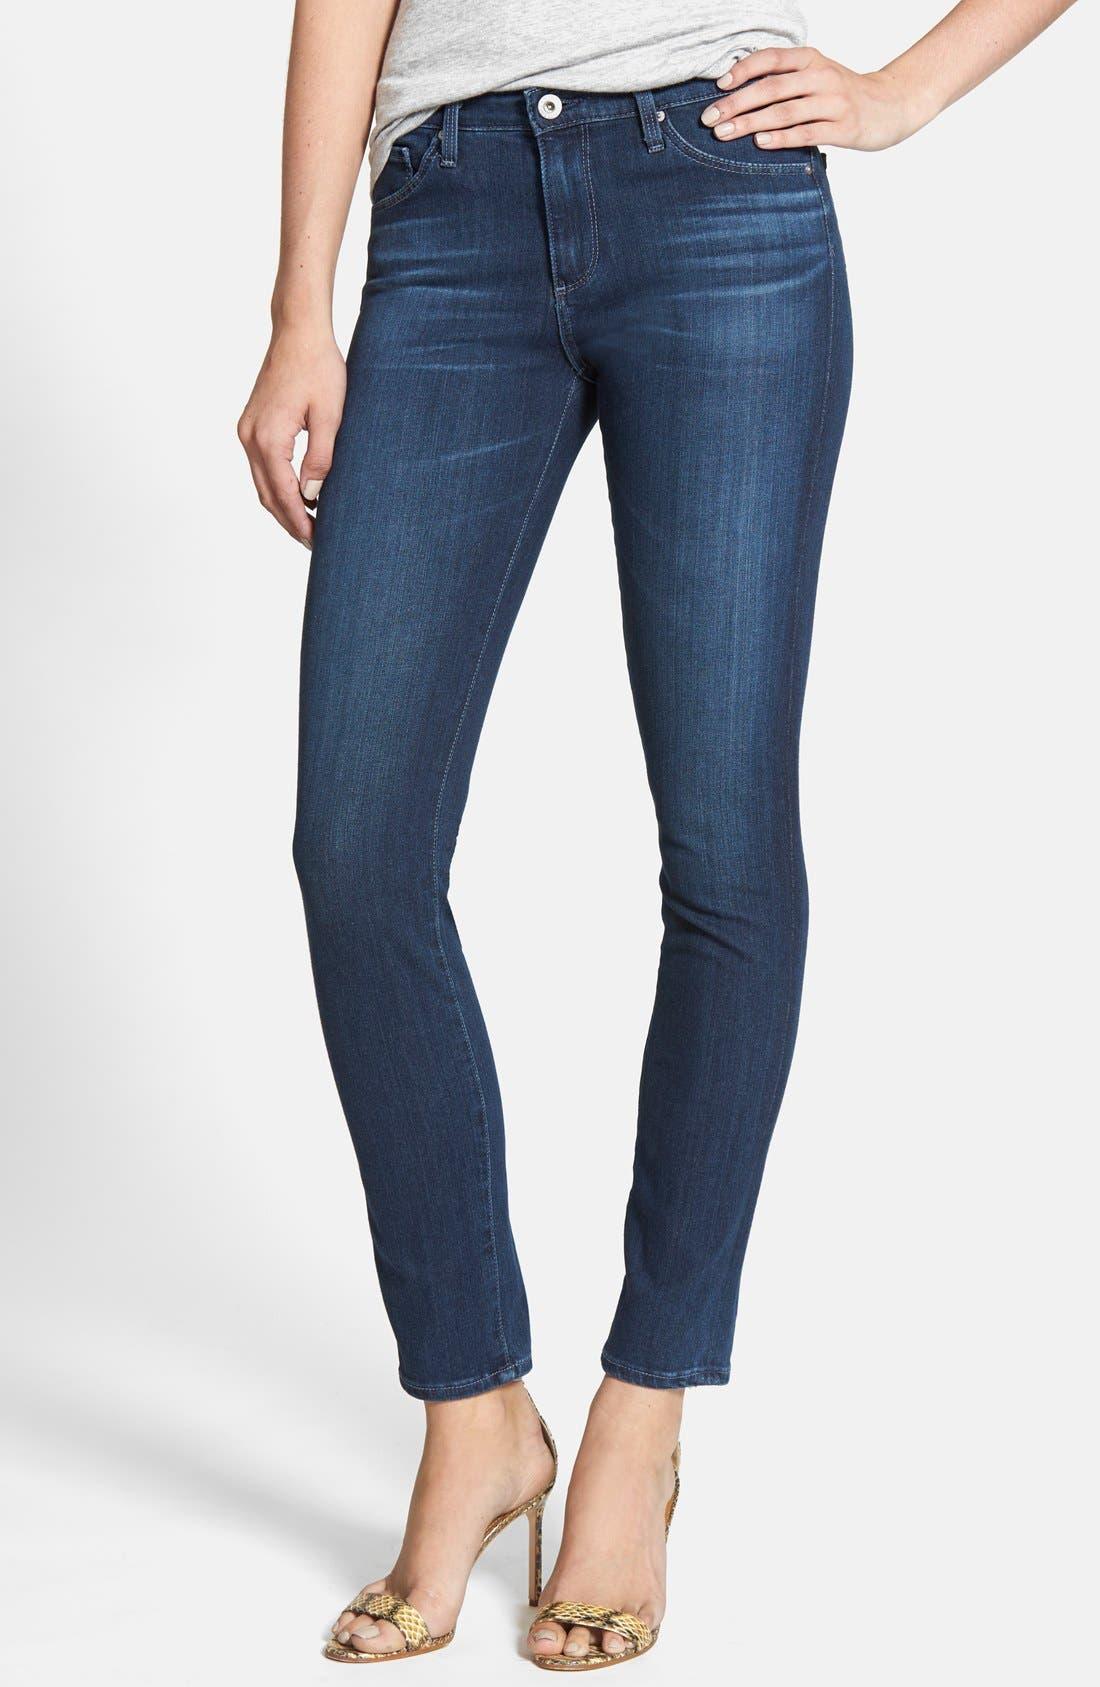 Main Image - AG 'Contour 360 - The Prima' Cigarette Leg Skinny Jeans